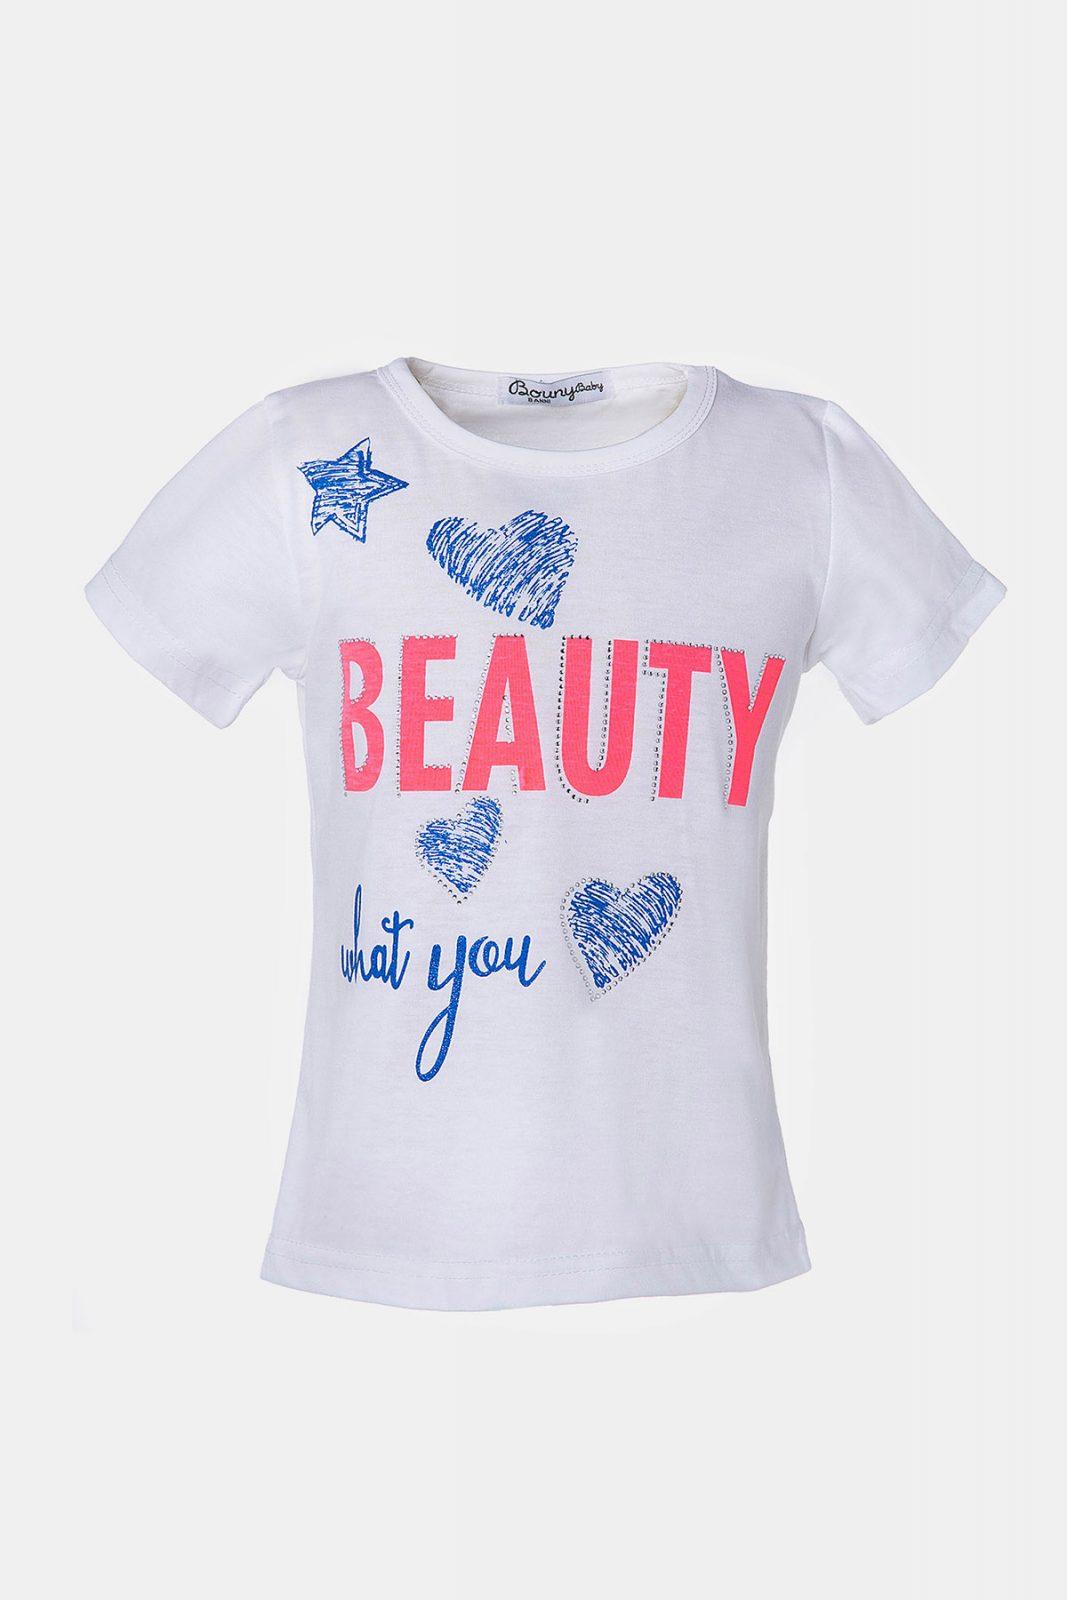 03ed814278c8 Παιδική λευκή μπλούζα - Ersas Παιδικά, Βρεφικά Ρούχα